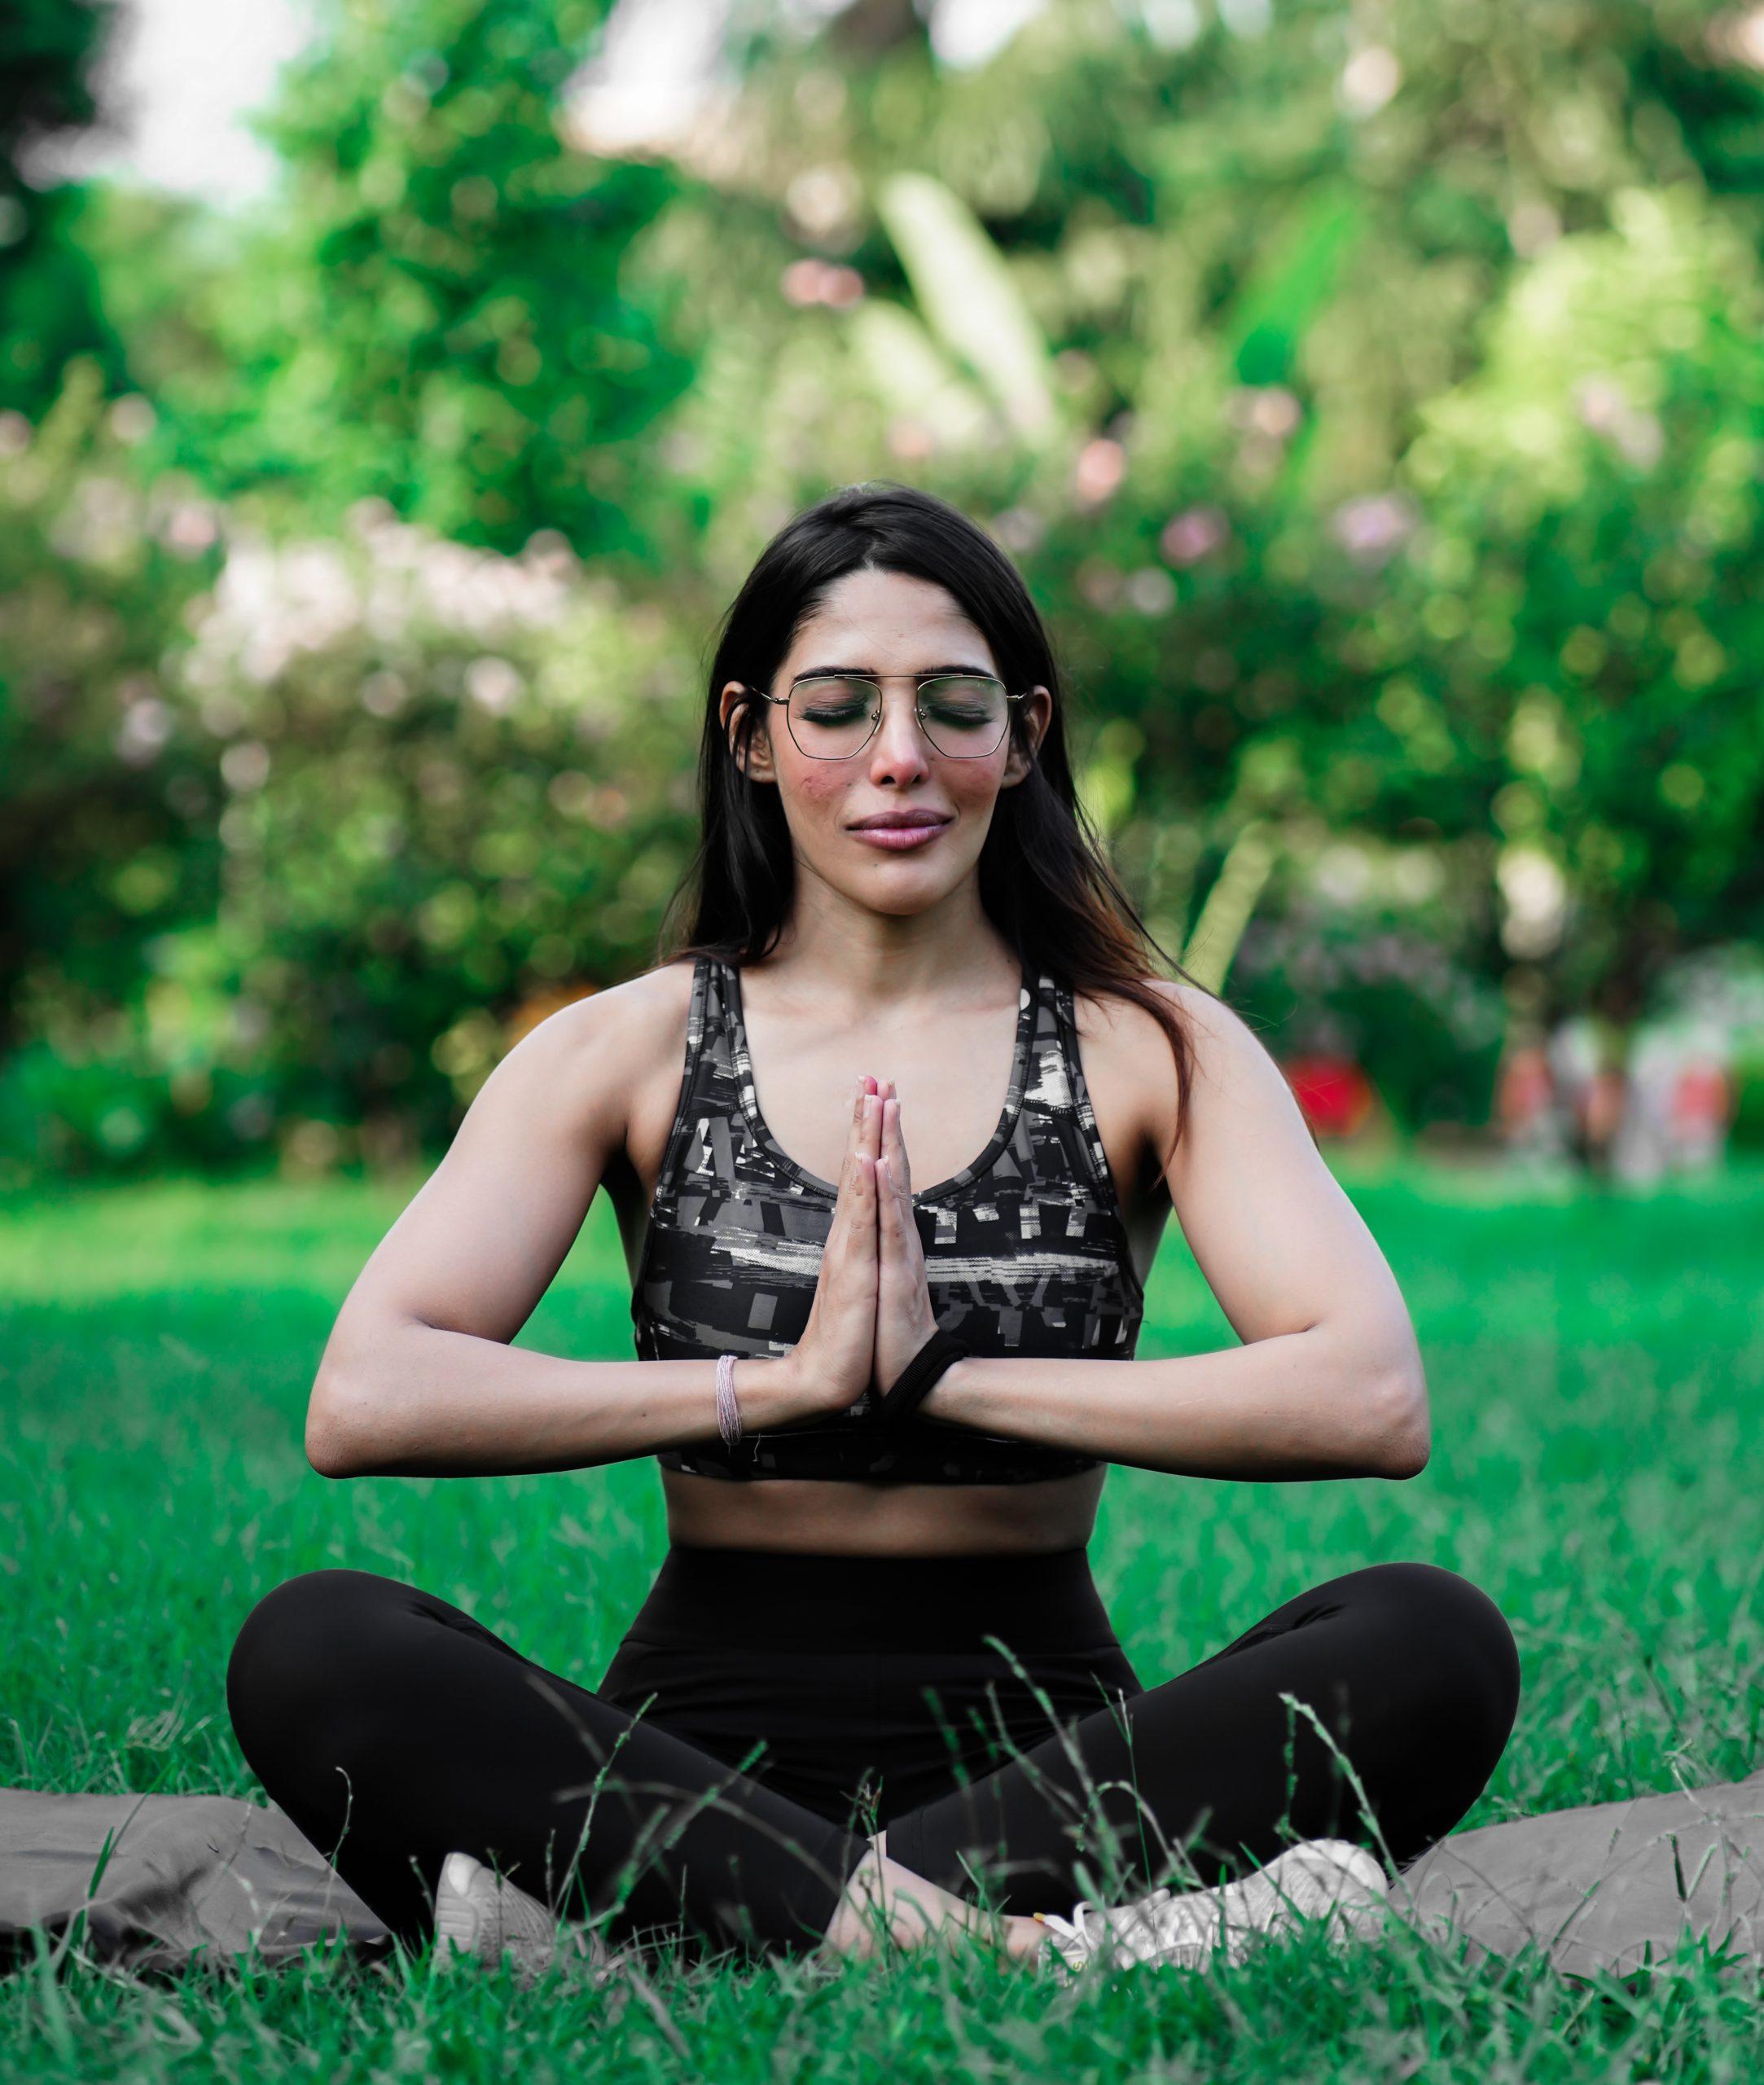 Meditating Yoga Fitness Model